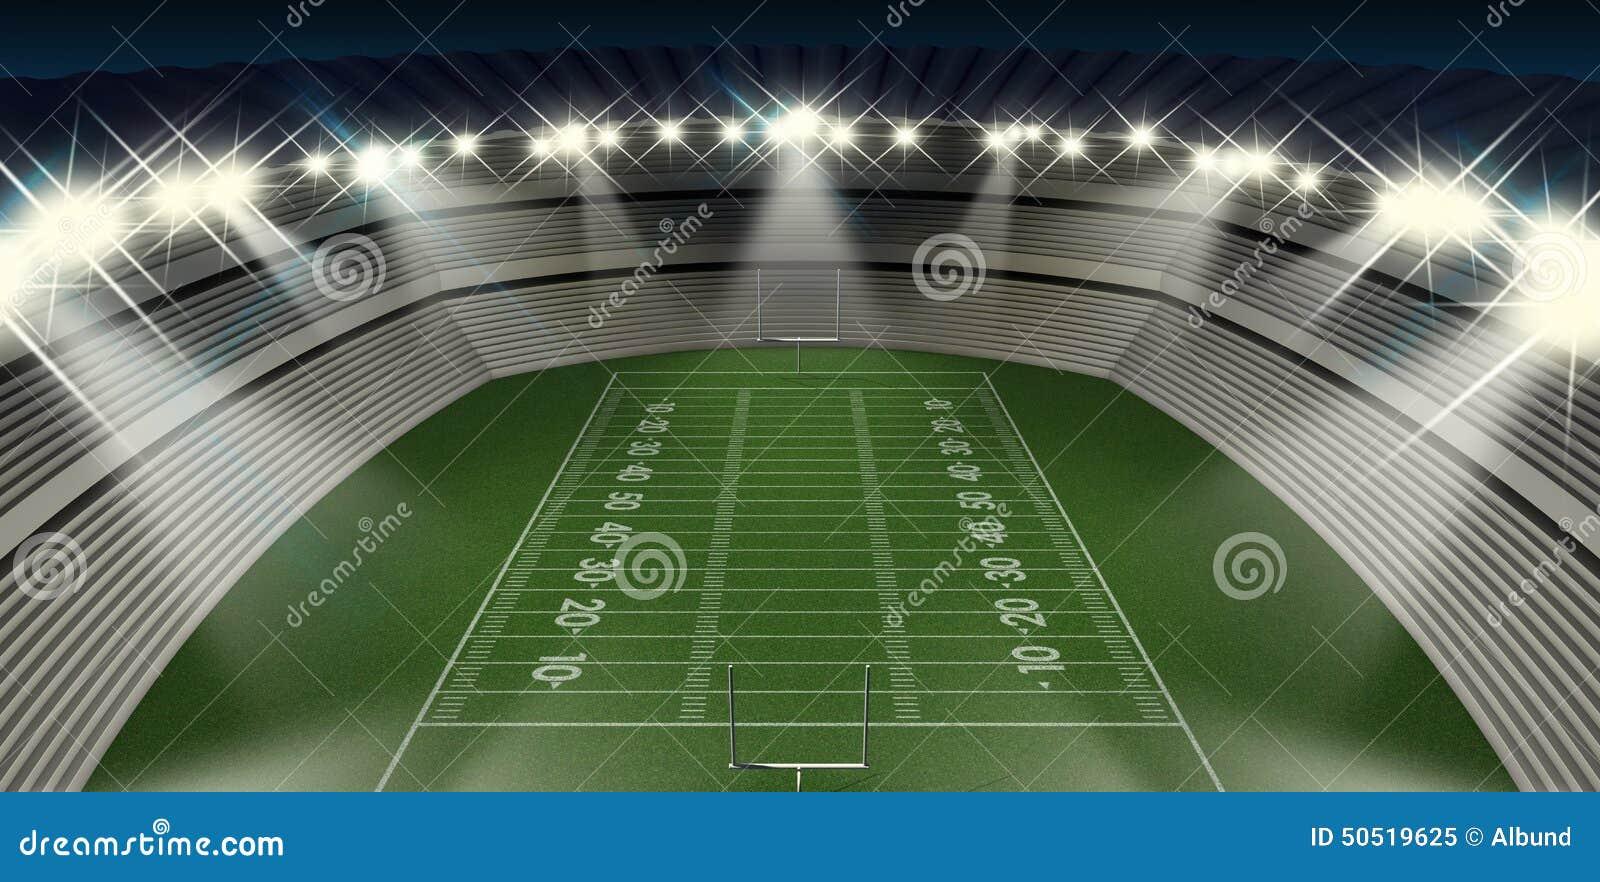 Fussball Stadions Nacht Stock Abbildung Illustration Von